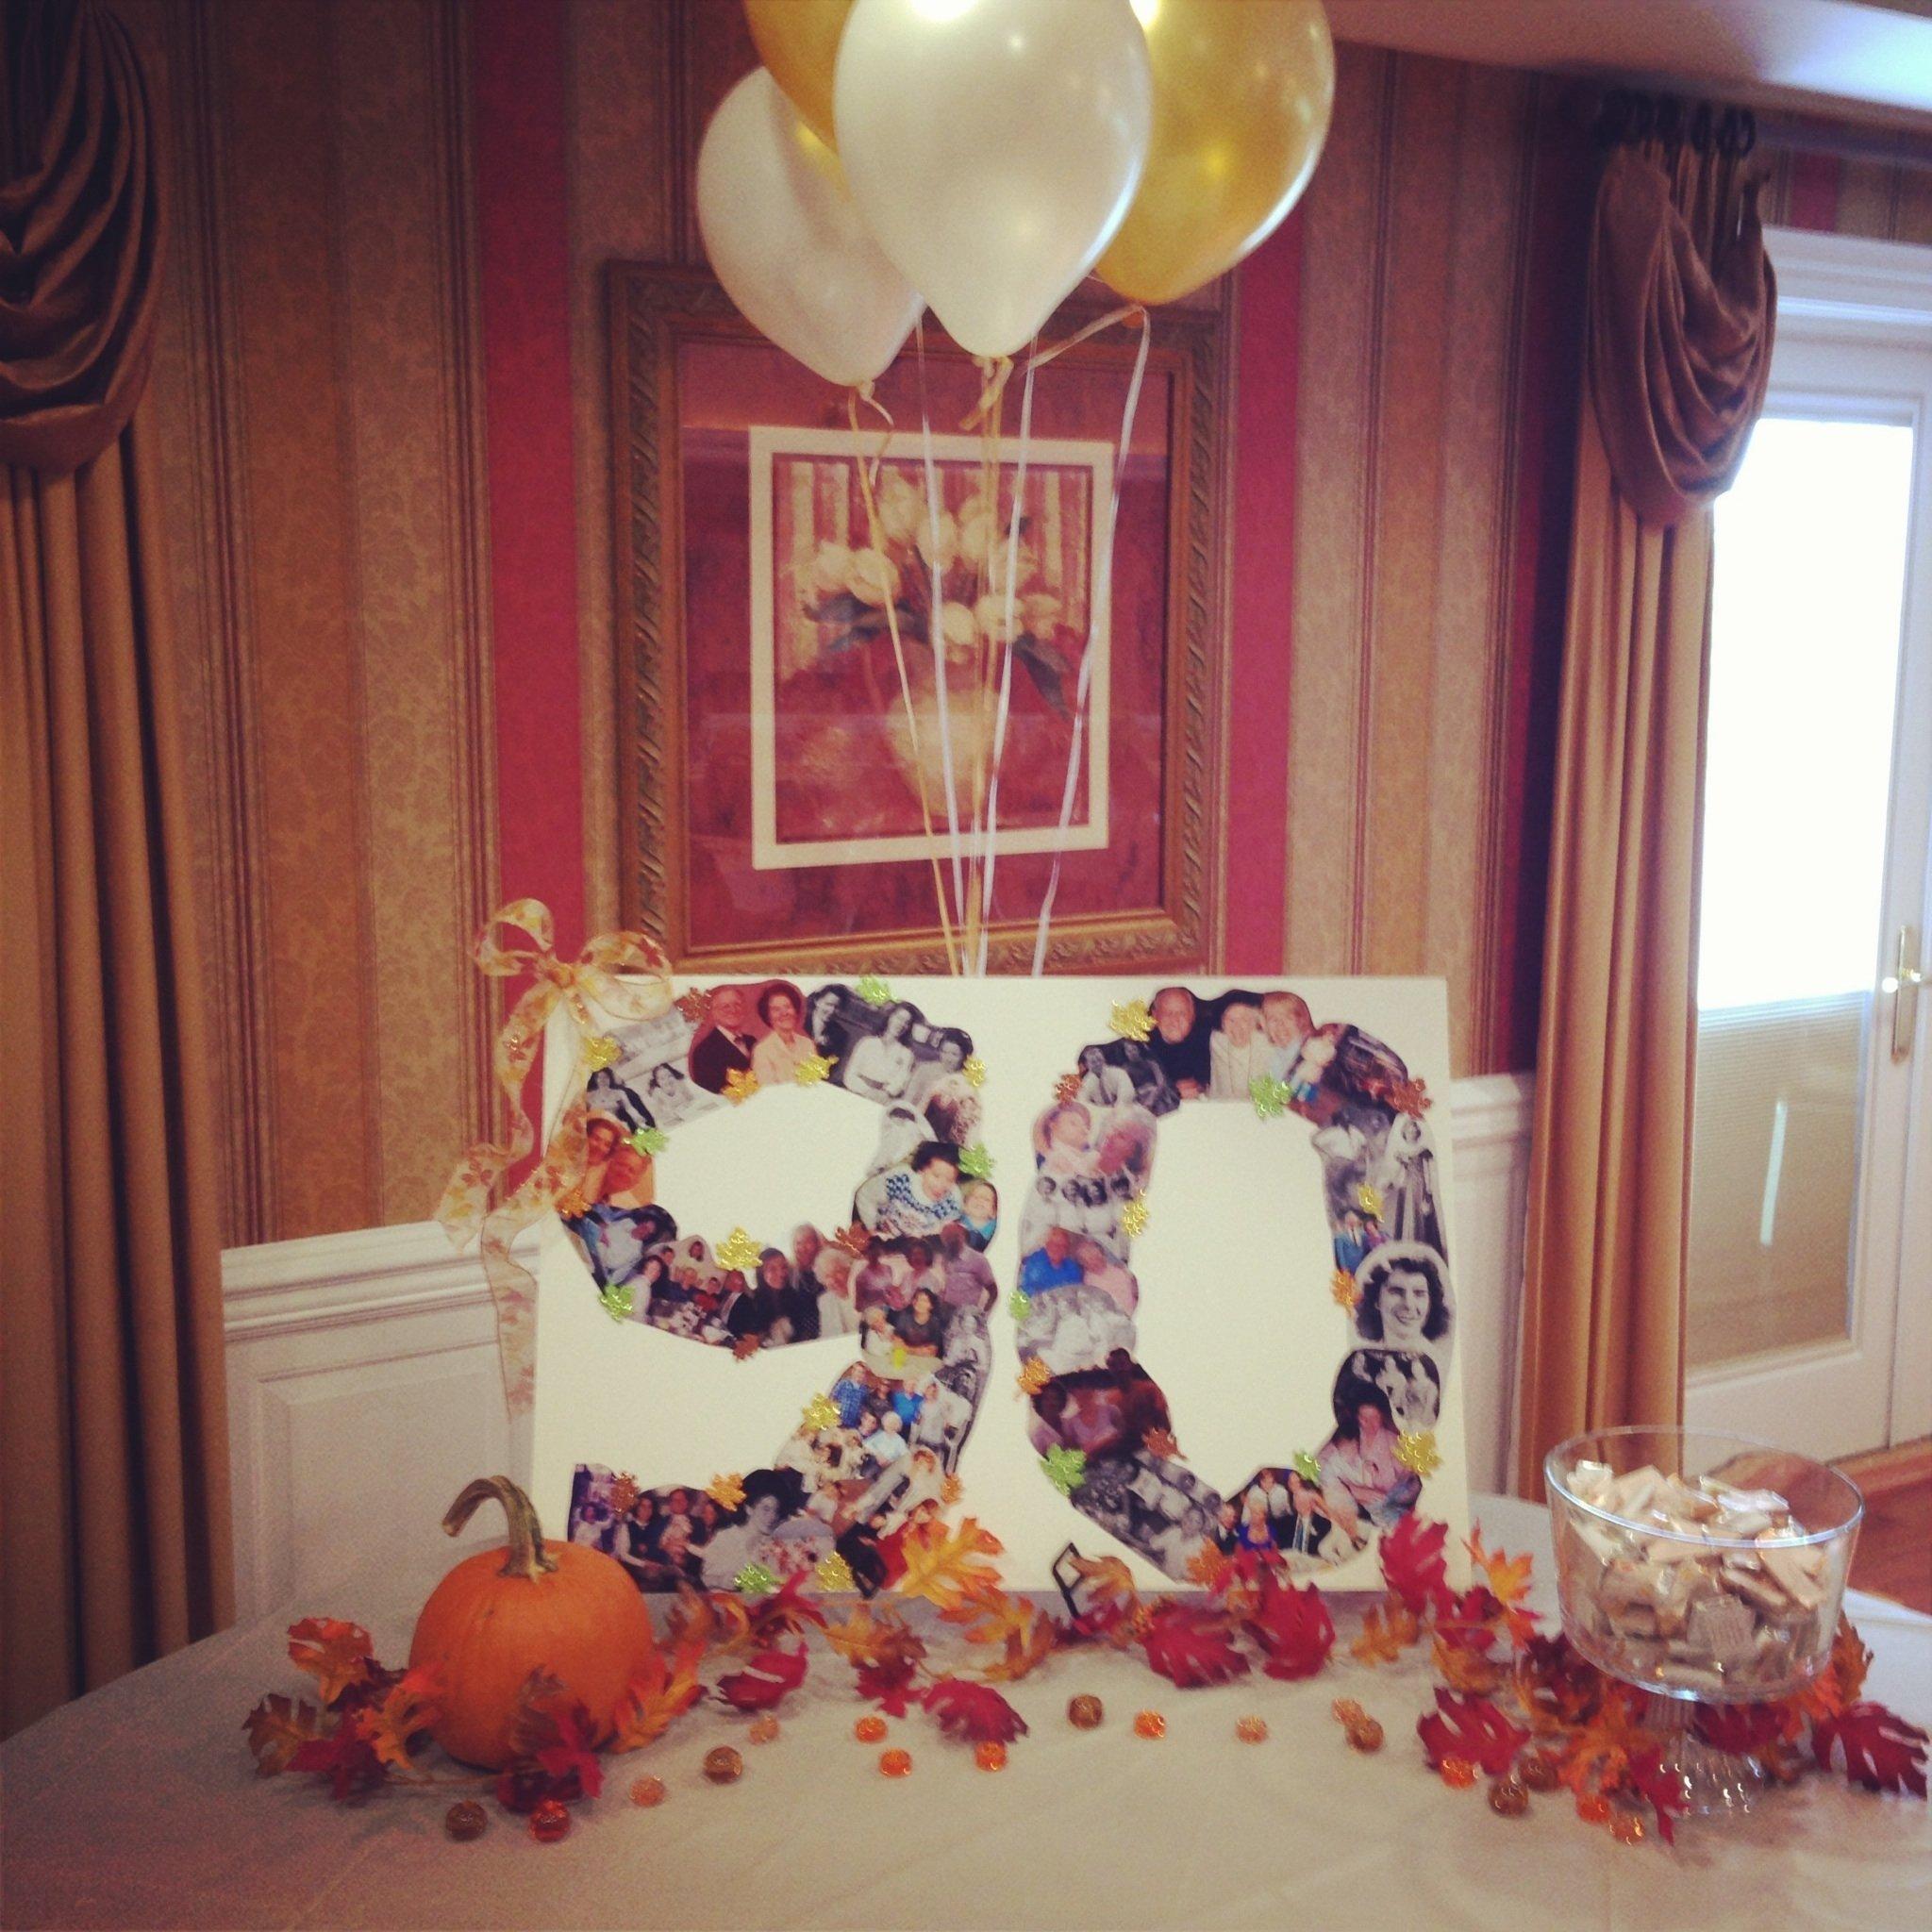 party ideas for 90th birthday margusriga baby party : 90th birthday